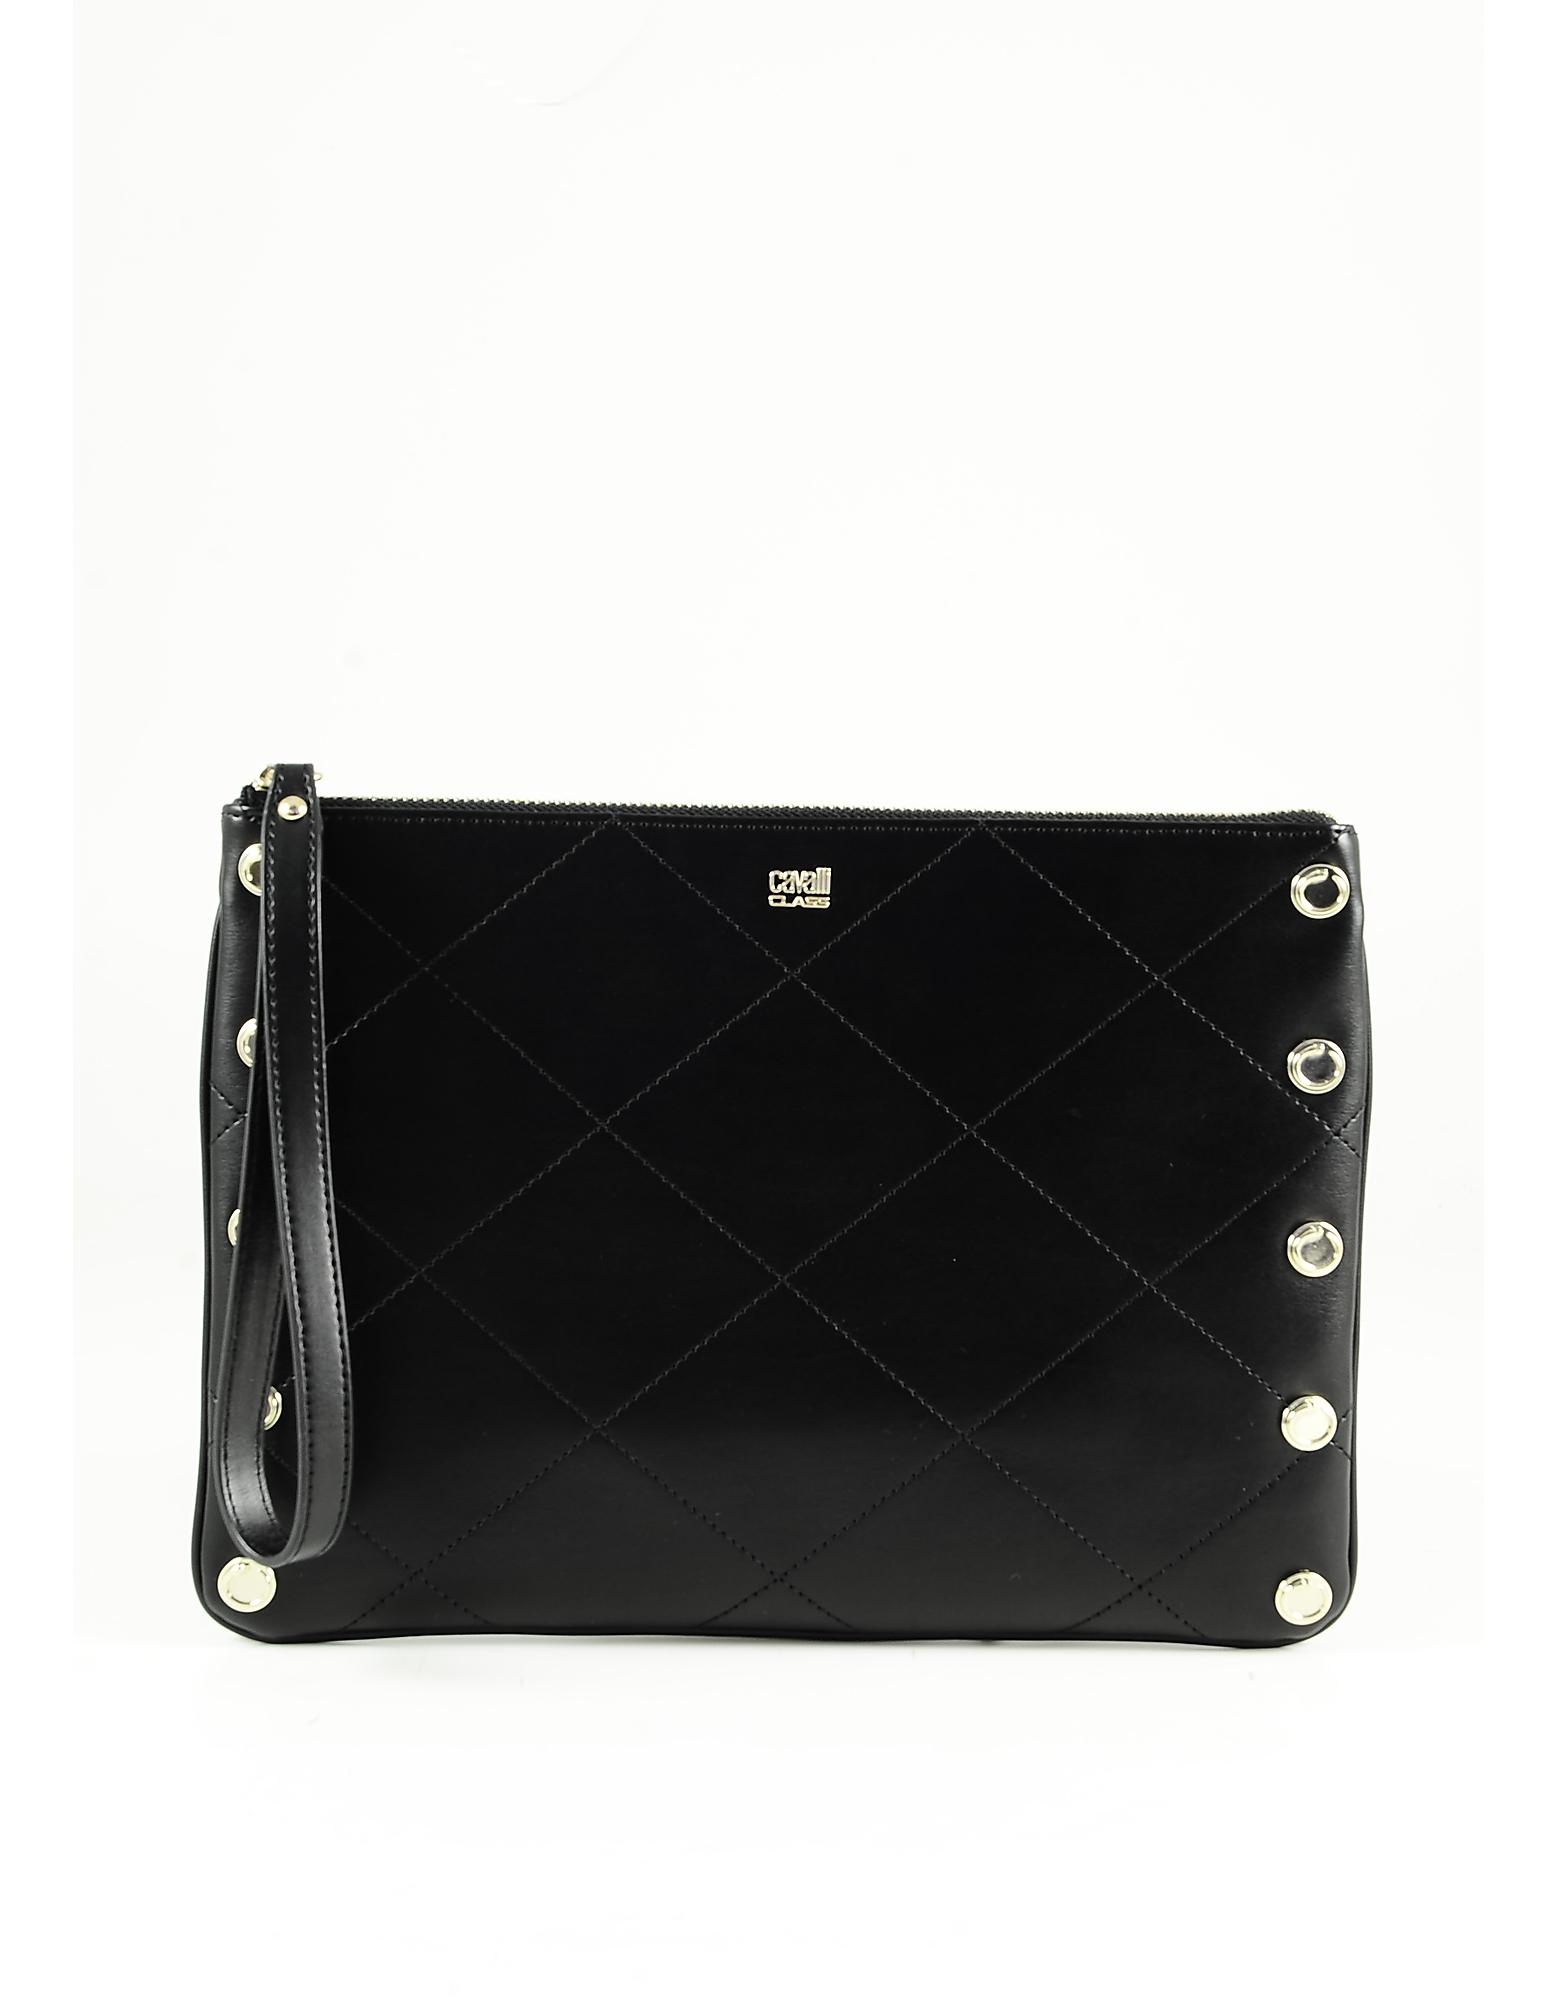 Class Roberto Cavalli Black Leather Clutch W/shoulder Strap